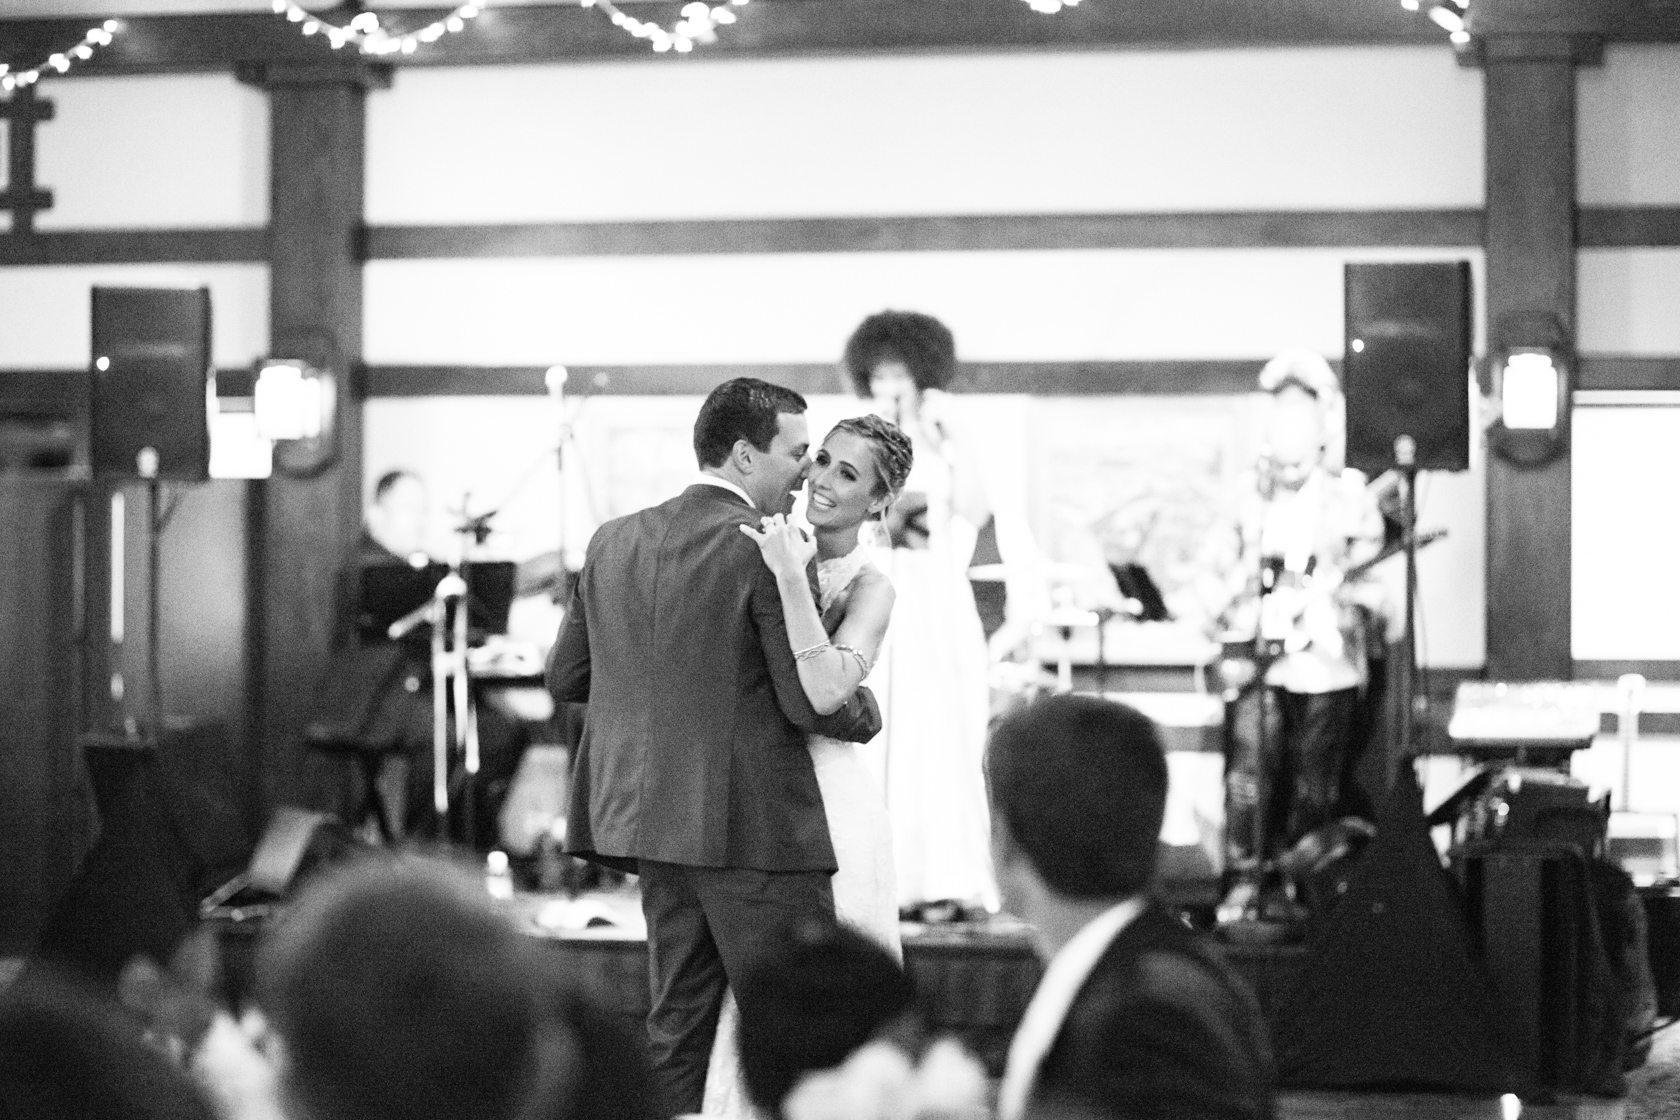 The_Lodge_at_Torrey_Pines_Wedding_093.jpg